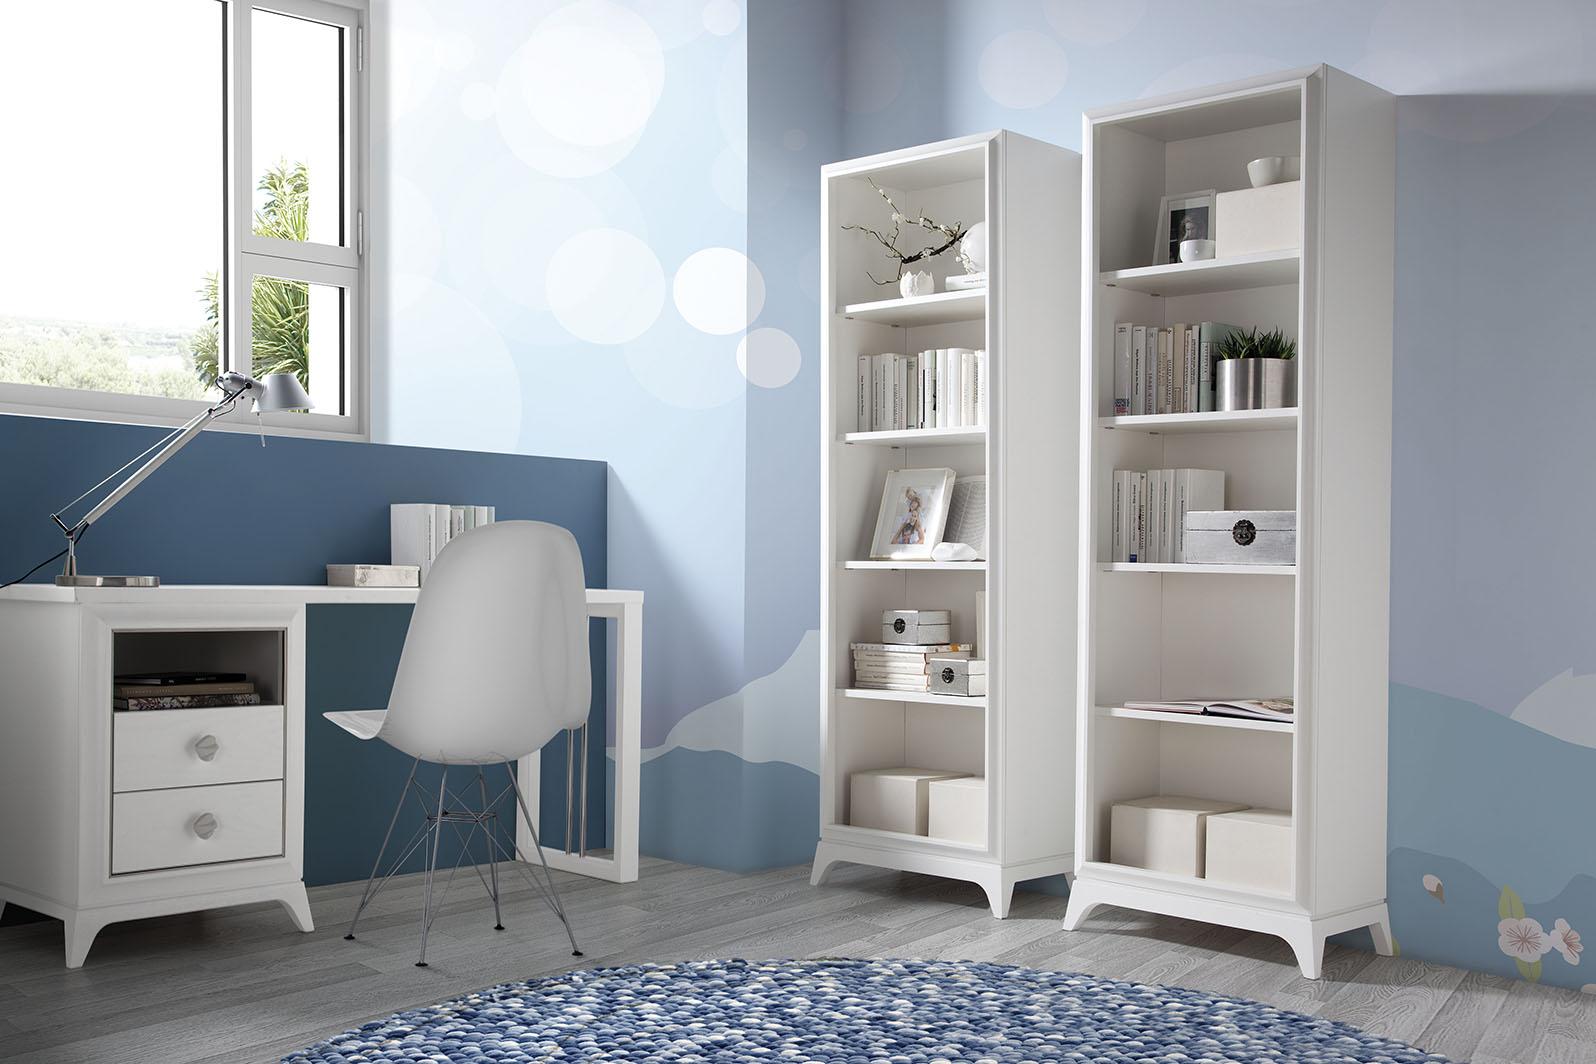 Muebles rodriguez seleccion murcia catalogos de muebles - Muebles rodriguez ...